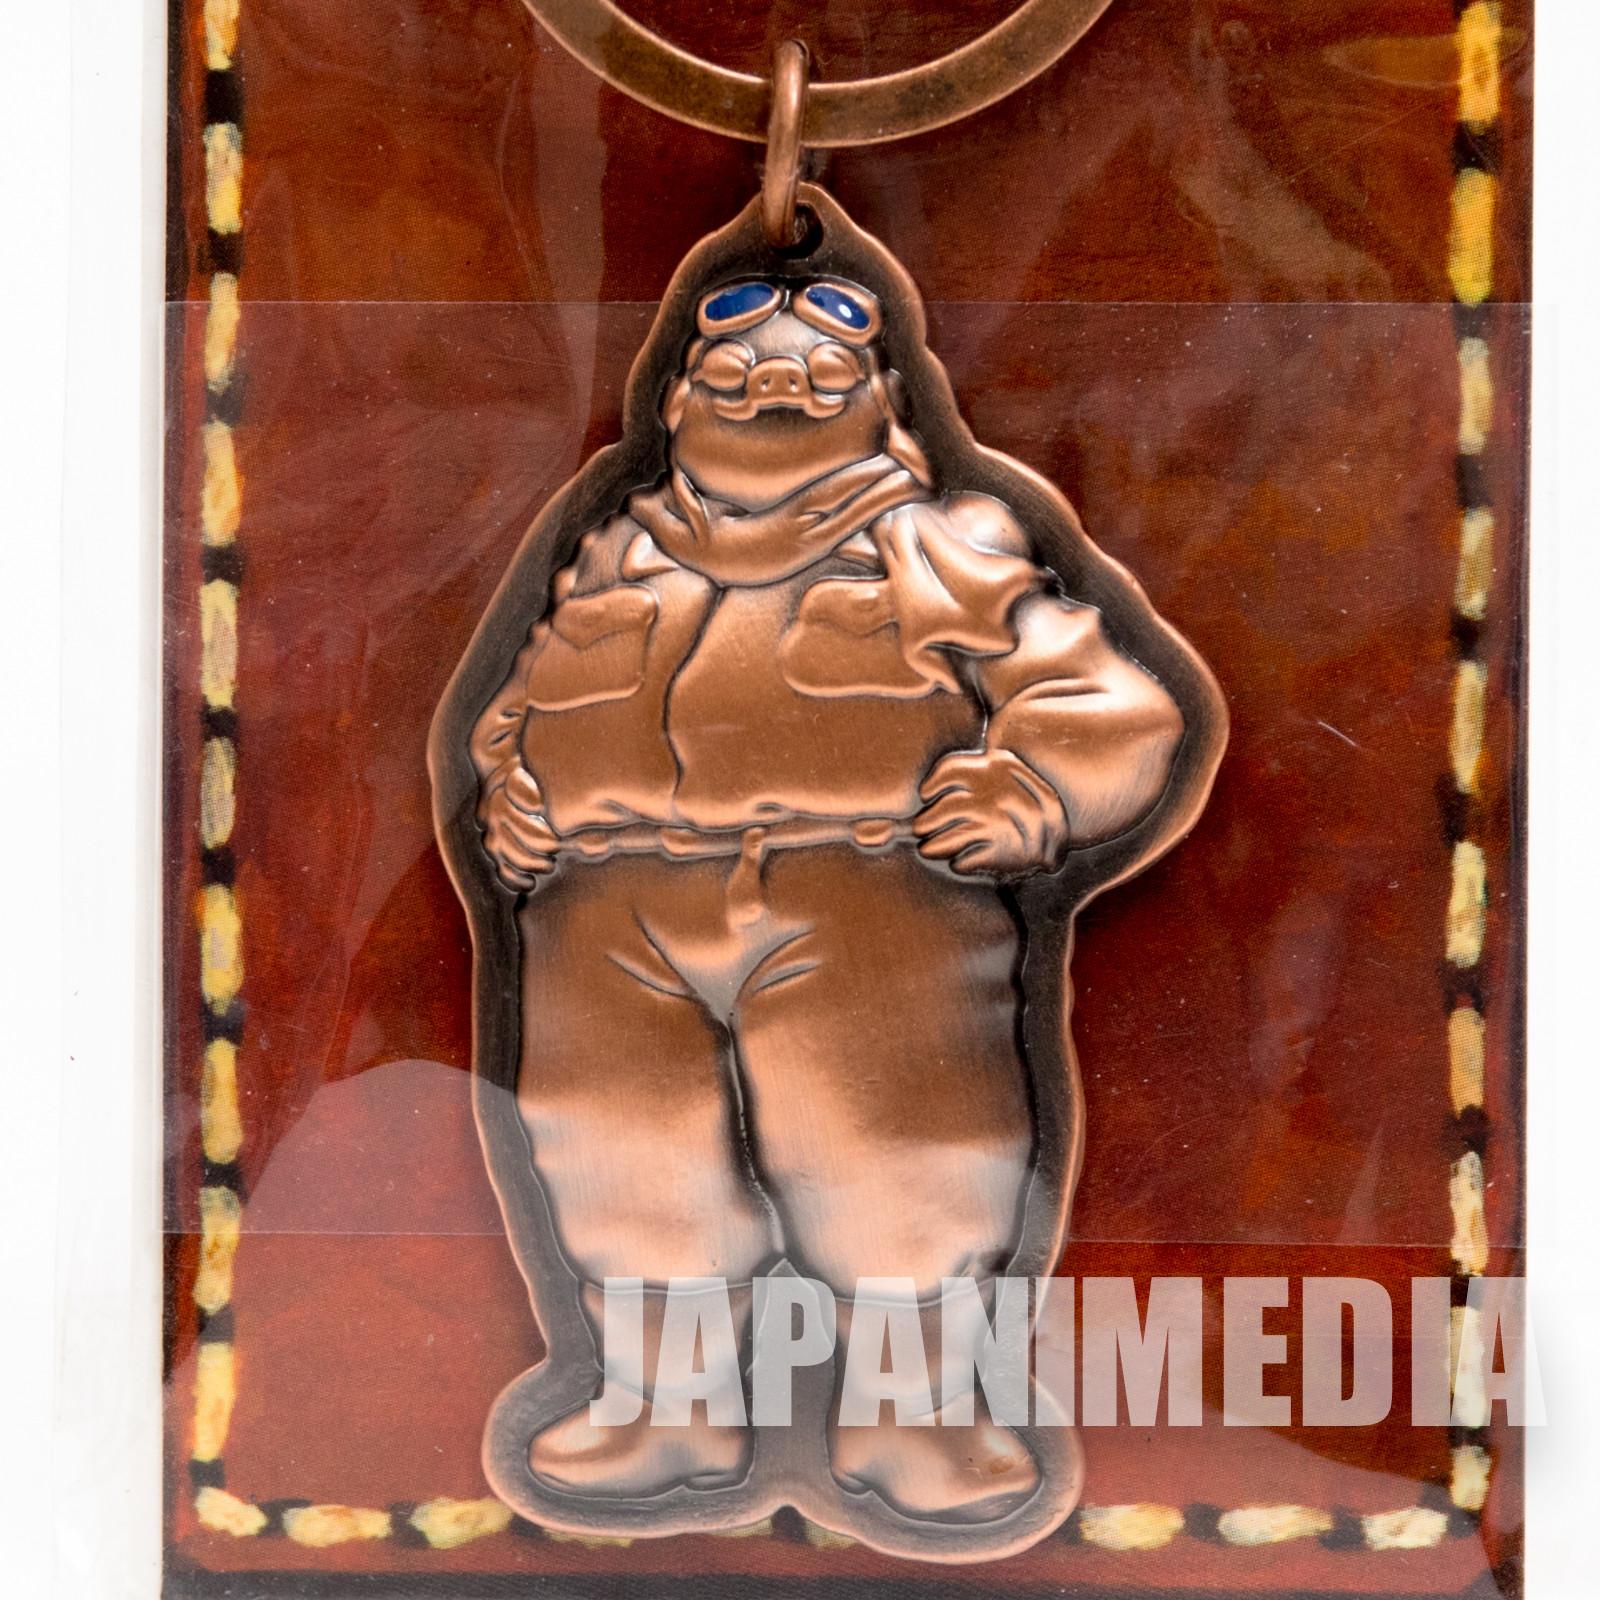 RARE! Porco Rosso Marco Pagot Metal Charm Keychain Ghibli Hayao Miyazaki